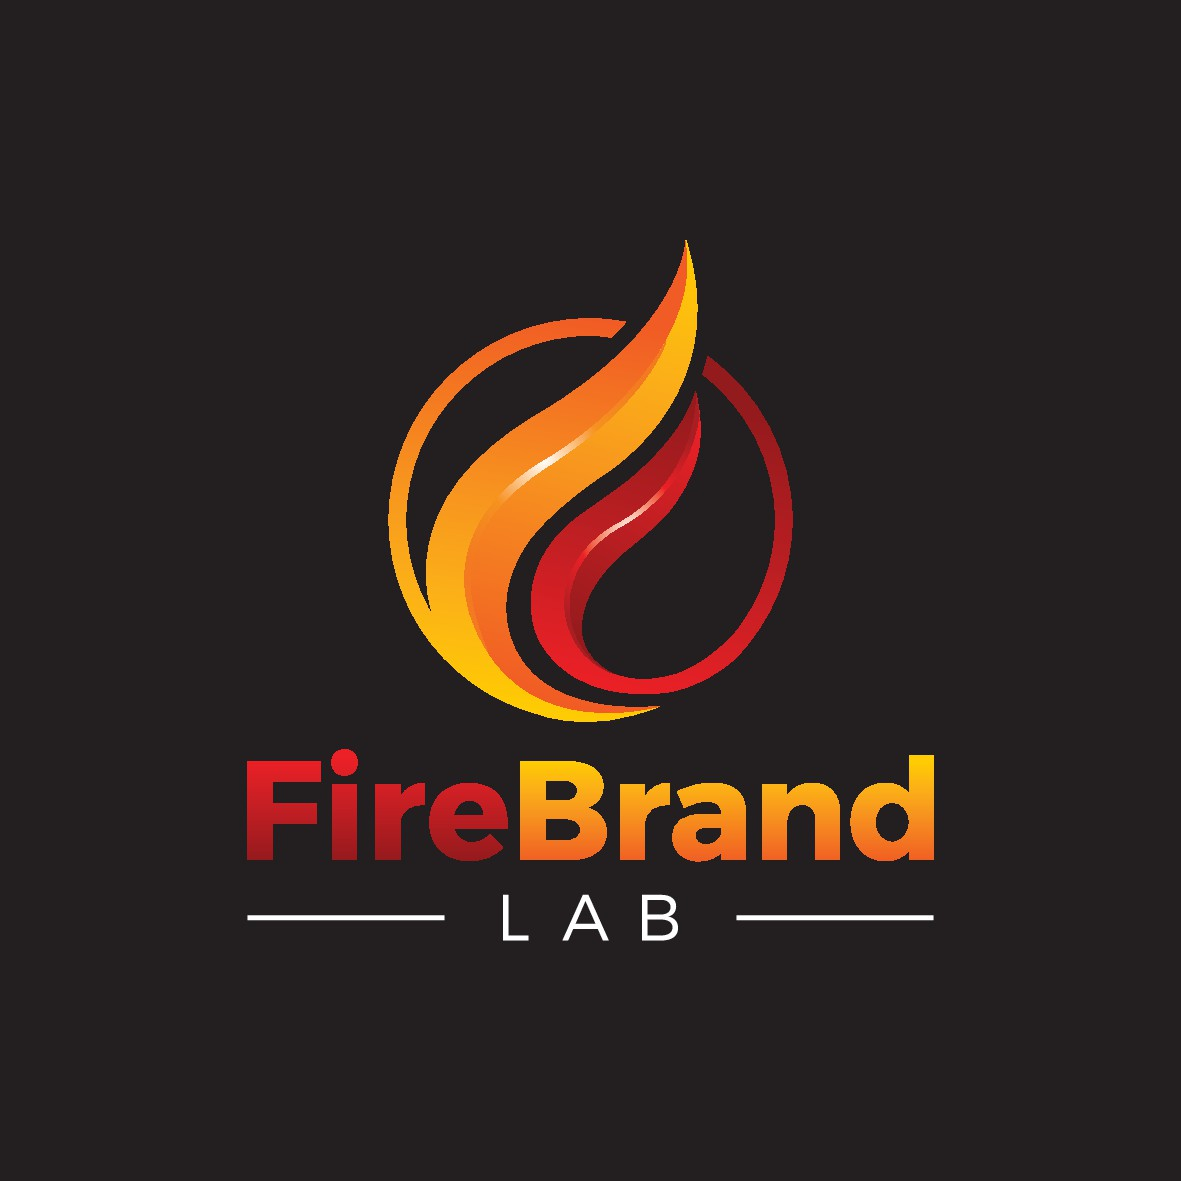 Design a logo for a cool tech startup